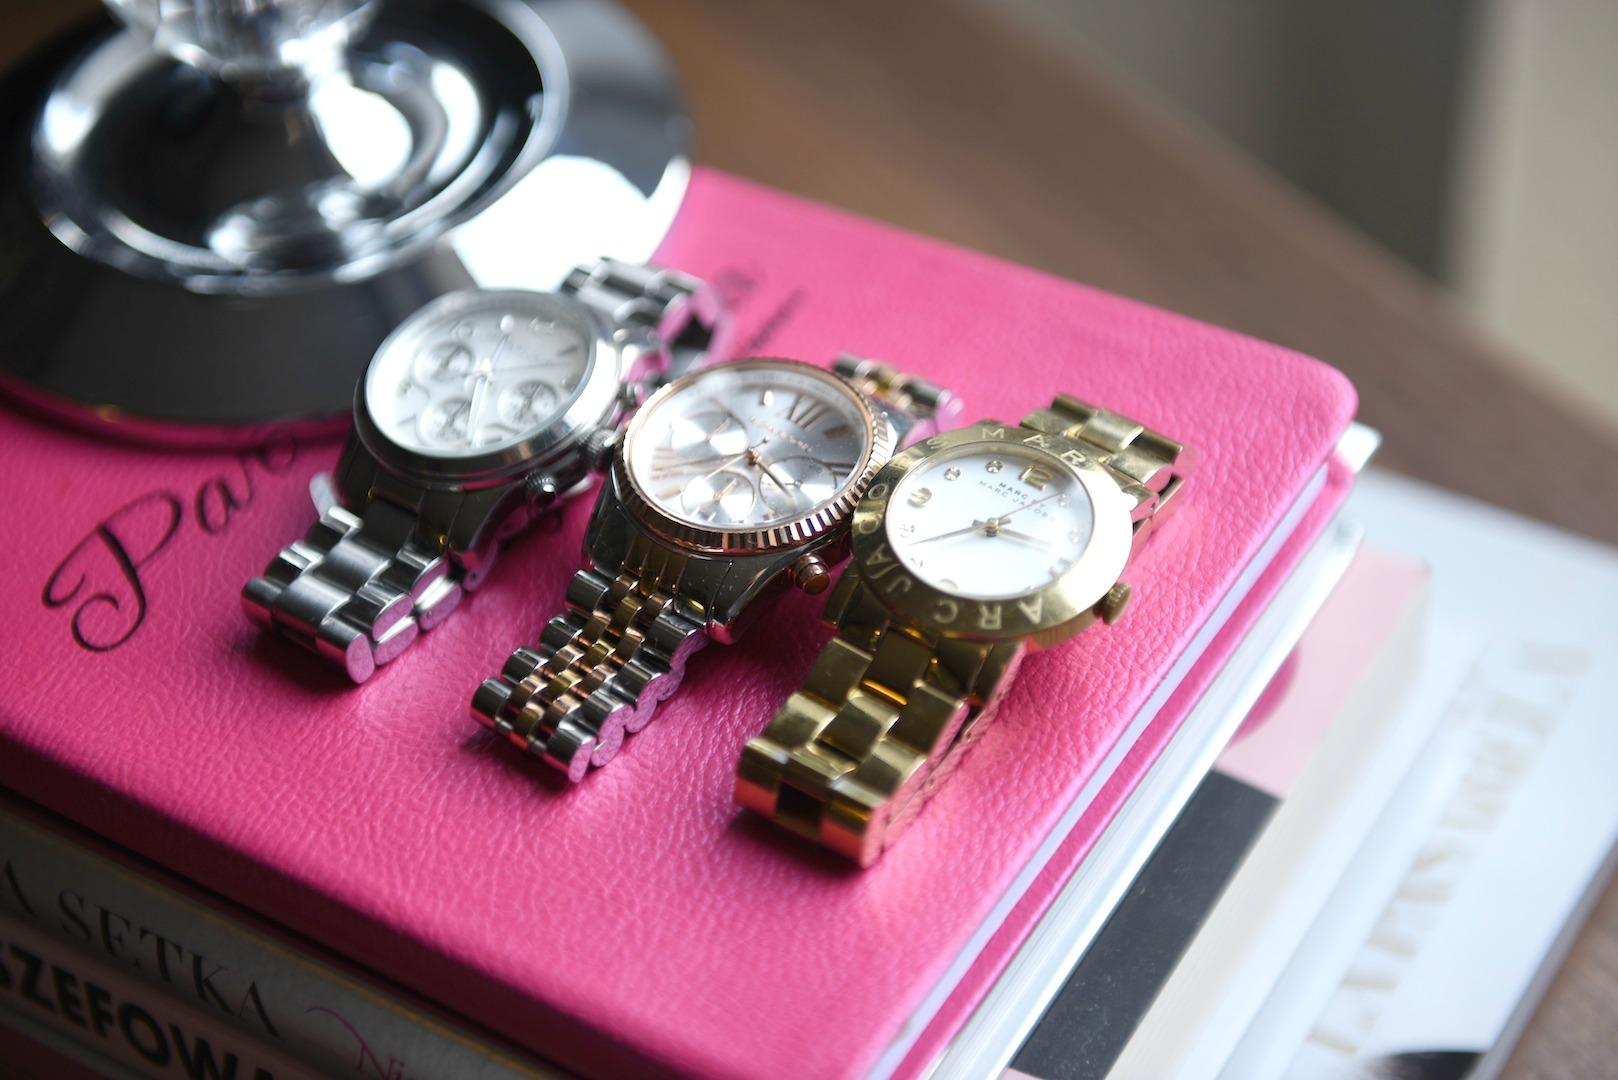 df149e160fa28 zegarek michael kors – Fashionelka.pl – blog